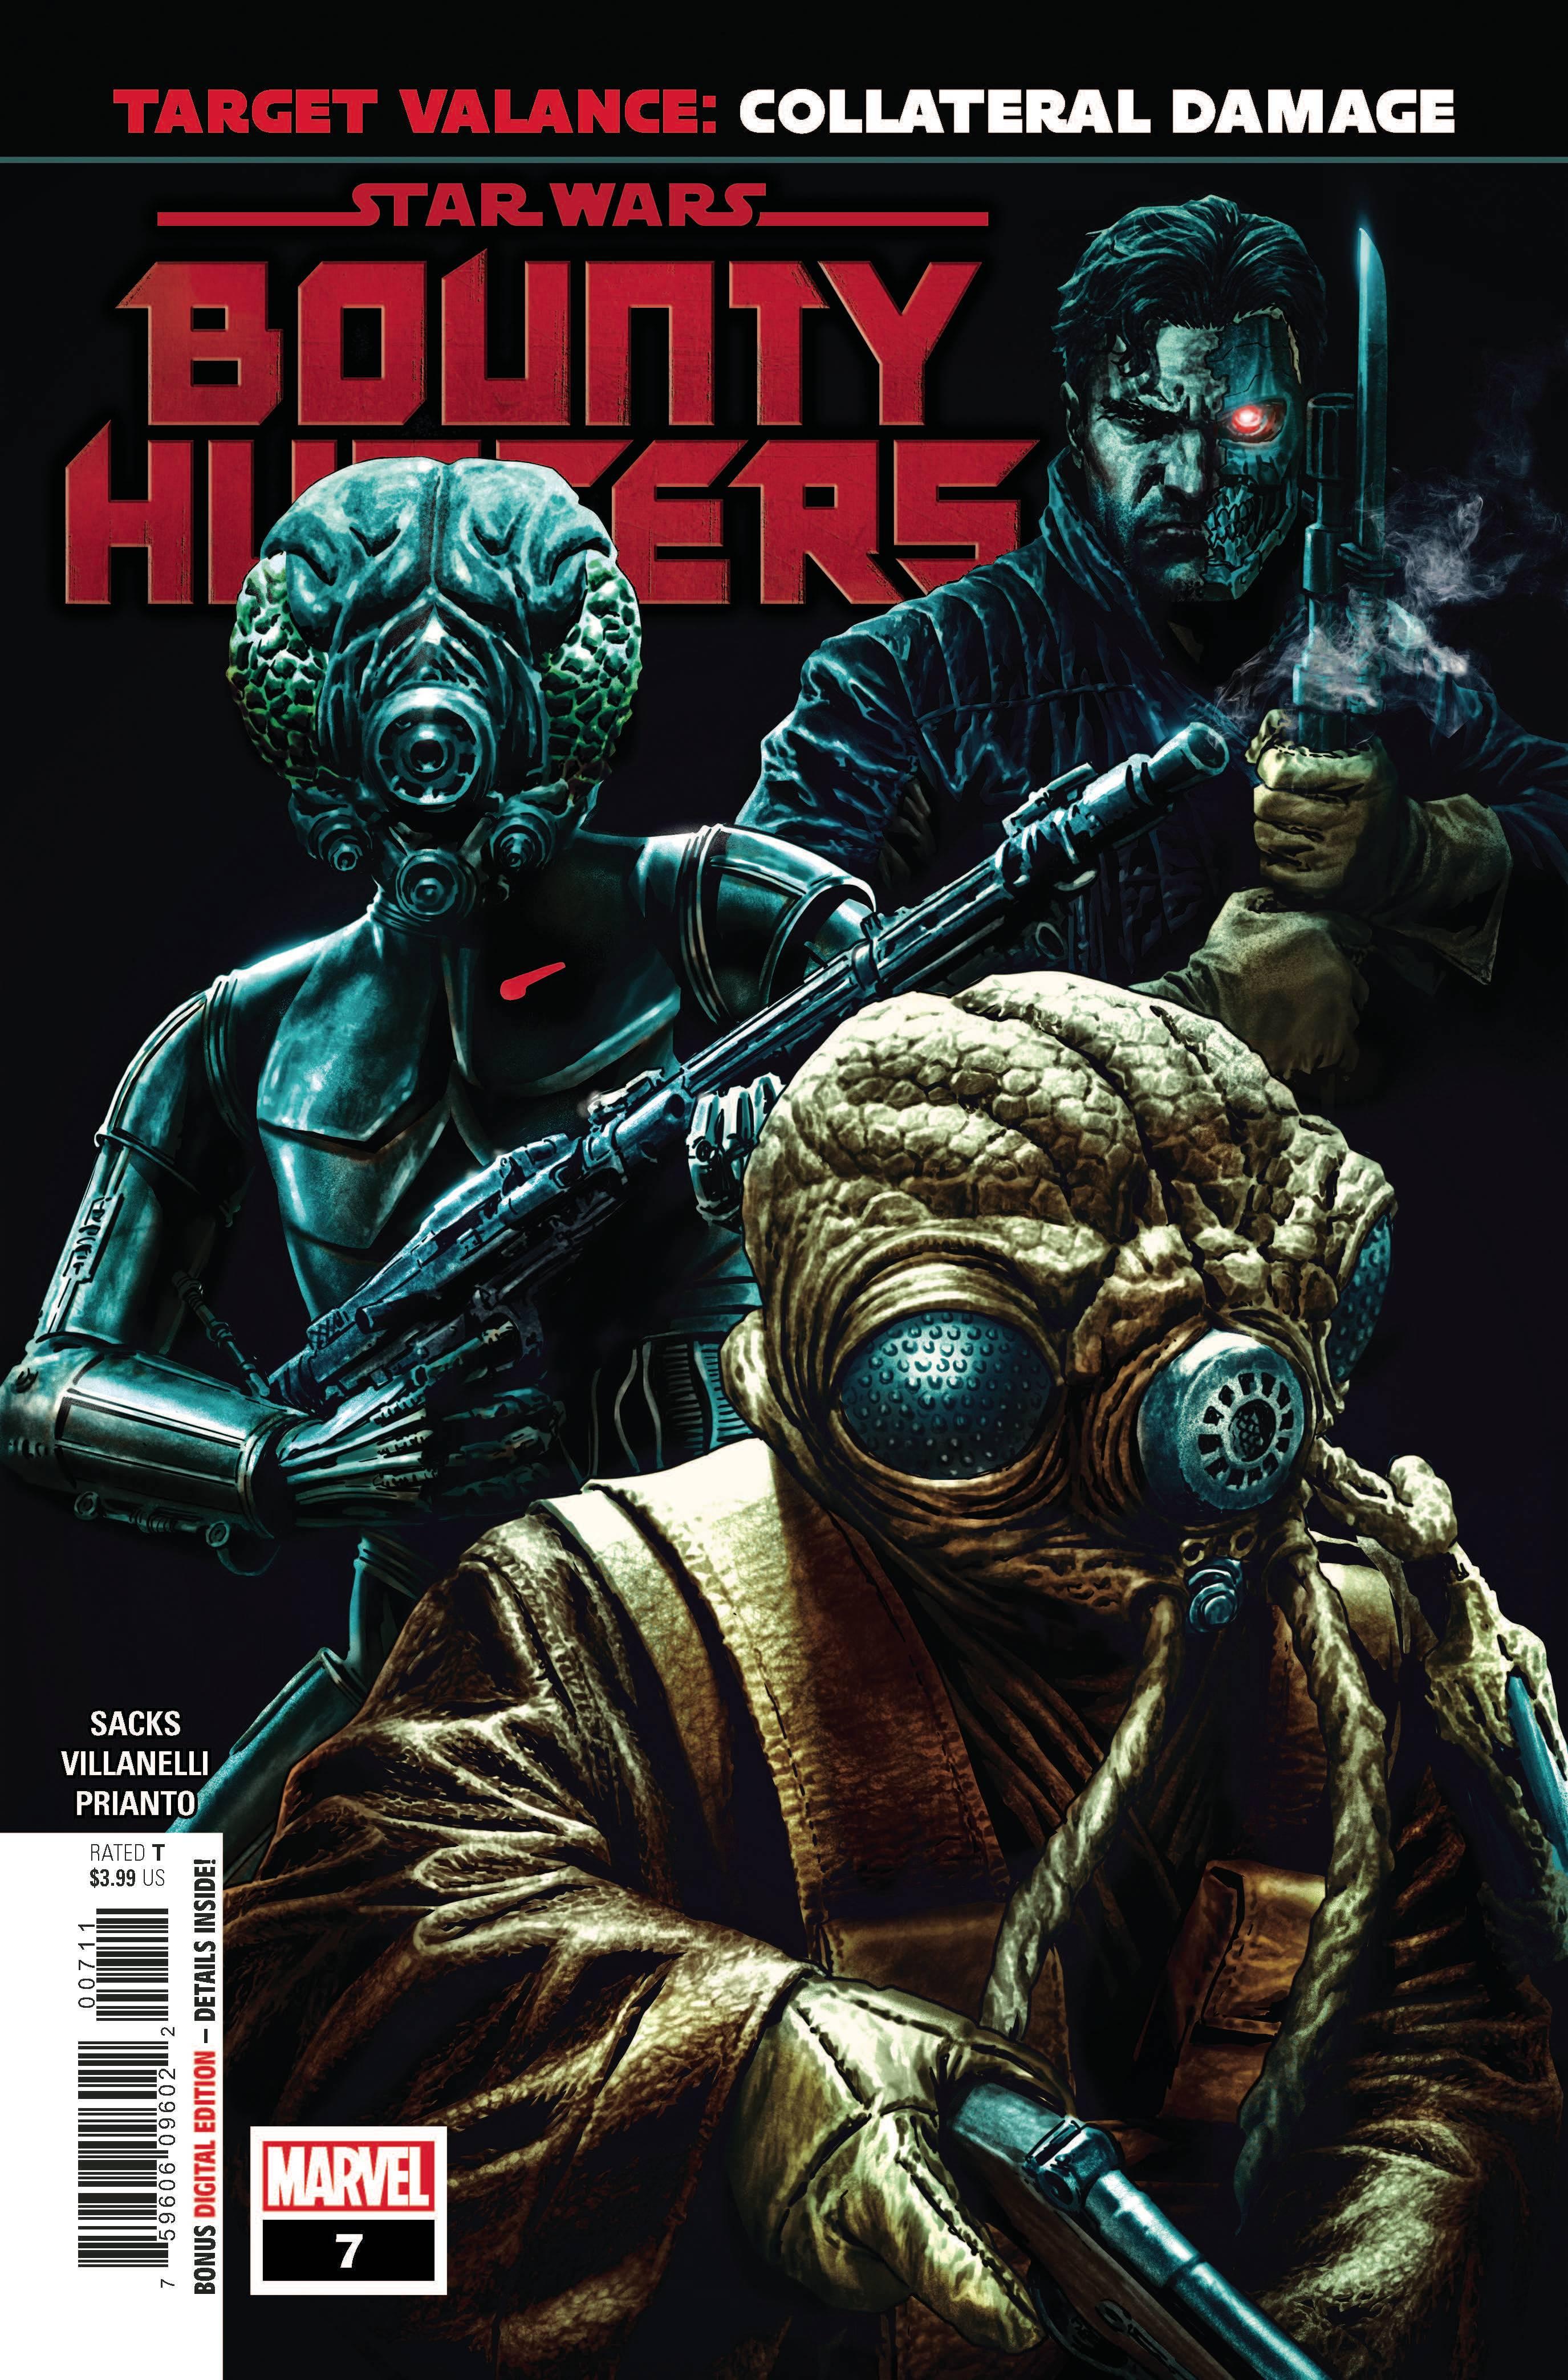 Star Wars: Bounty Hunters #7 (2020)